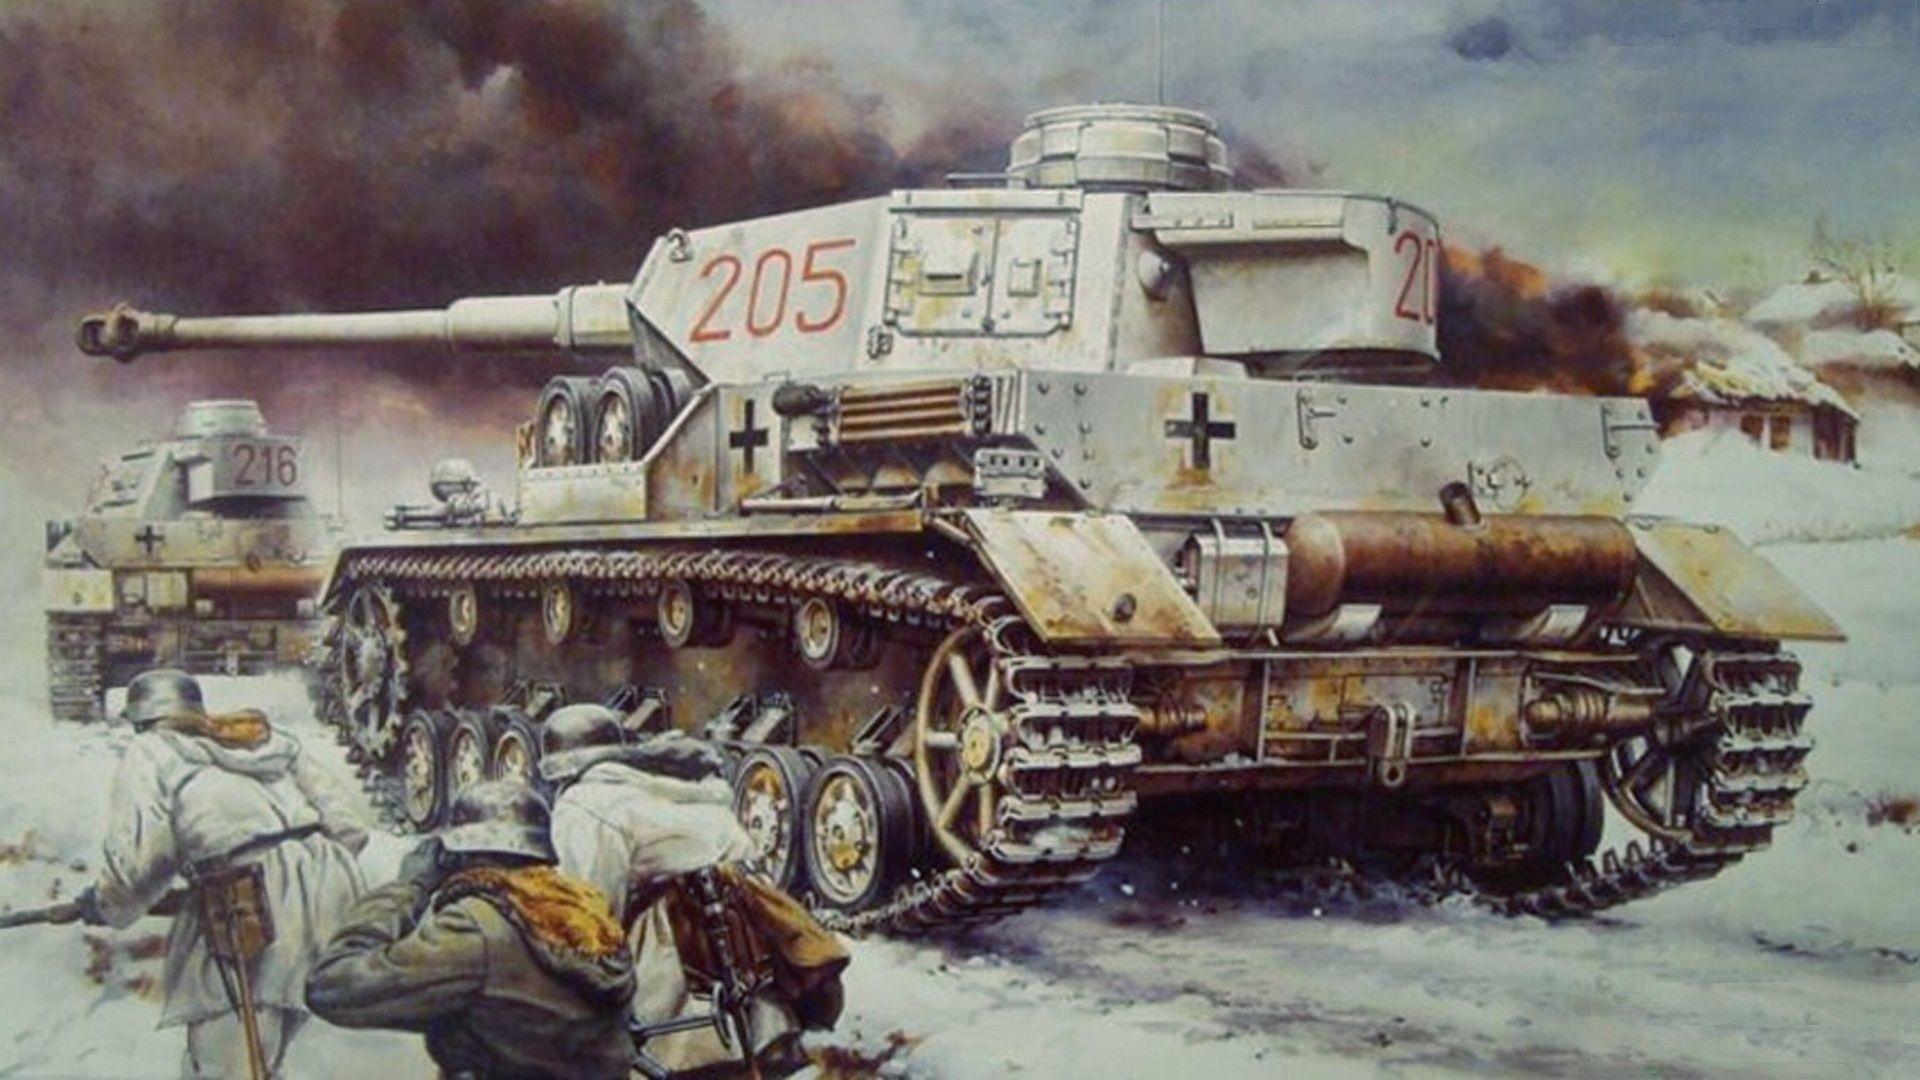 Res: 1920x1080, Panzer IV tank wallpaper